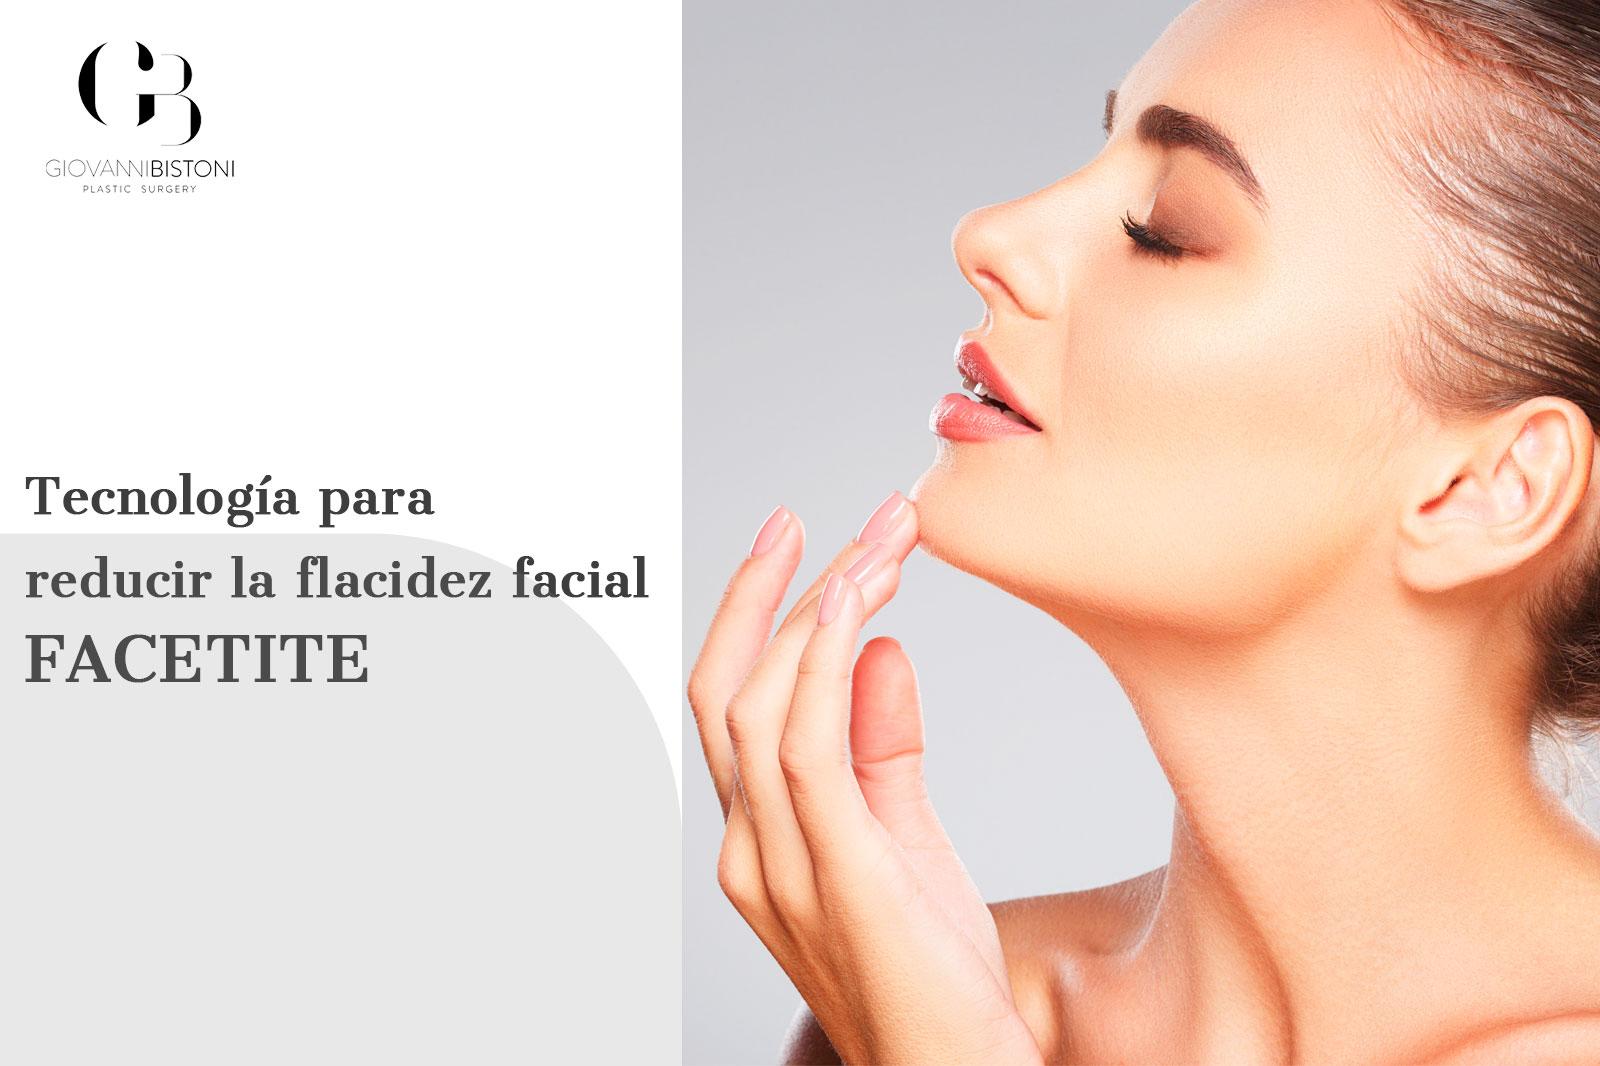 Facetite tecnología para reducir la flacidez facial